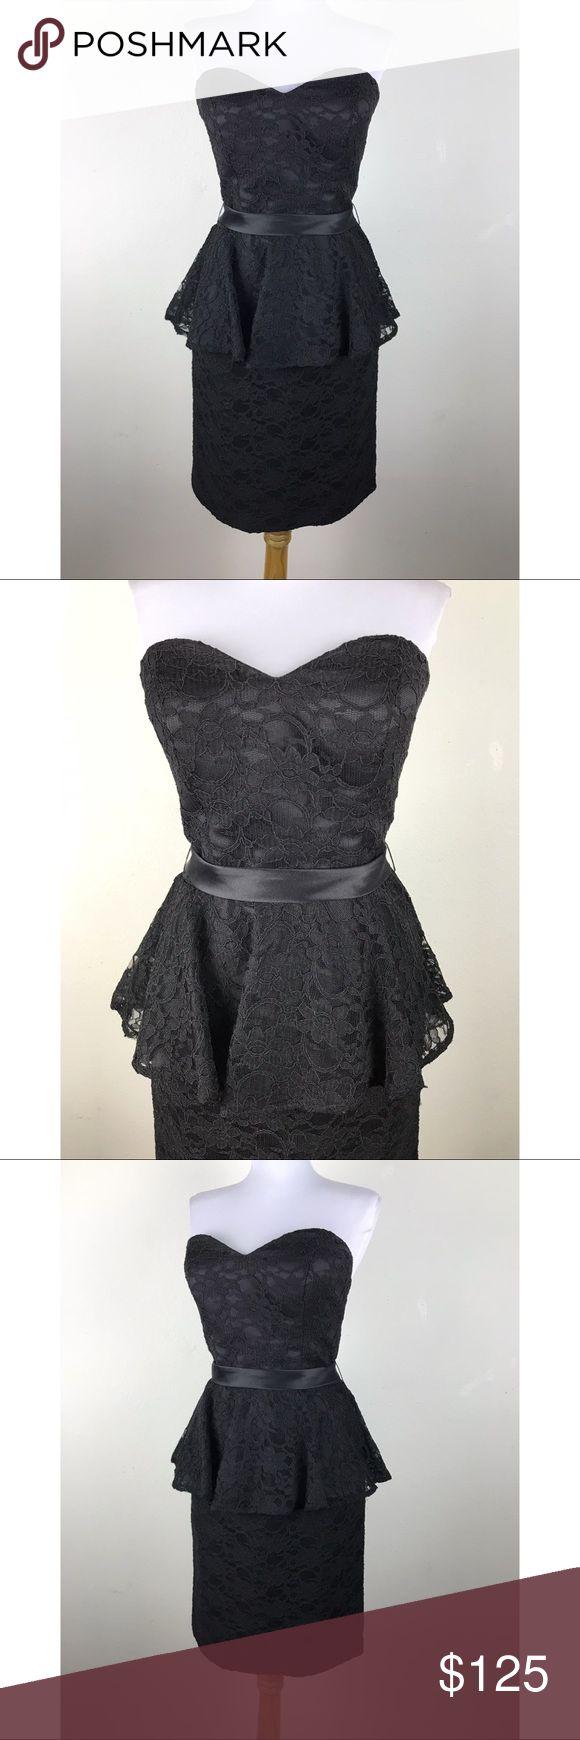 I just added this listing on Poshmark: Mori Lee Dress Size S Black Lace Peplum Prom. #shopmycloset #poshmark #fashion #shopping #style #forsale #Mori Lee #Dresses & Skirts